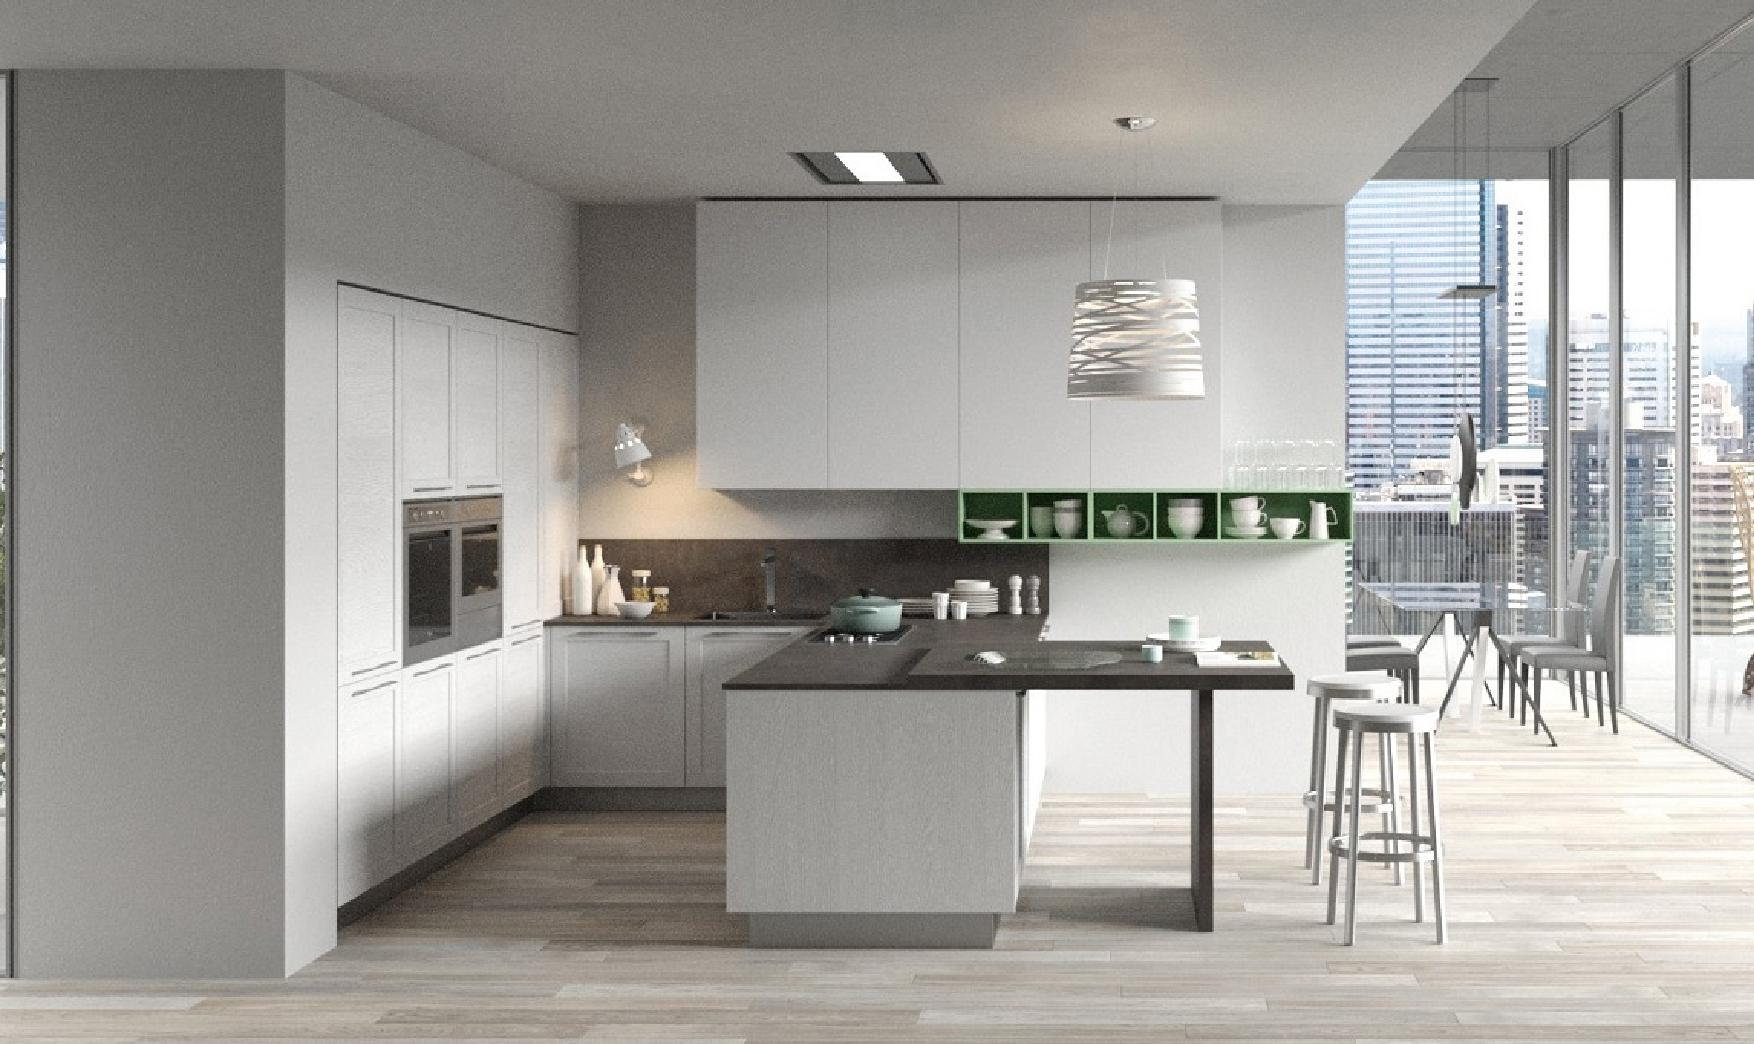 Arredo 3 Prezzi Cucine cucine moderne a carbonia iglesias con arredo3 – show room